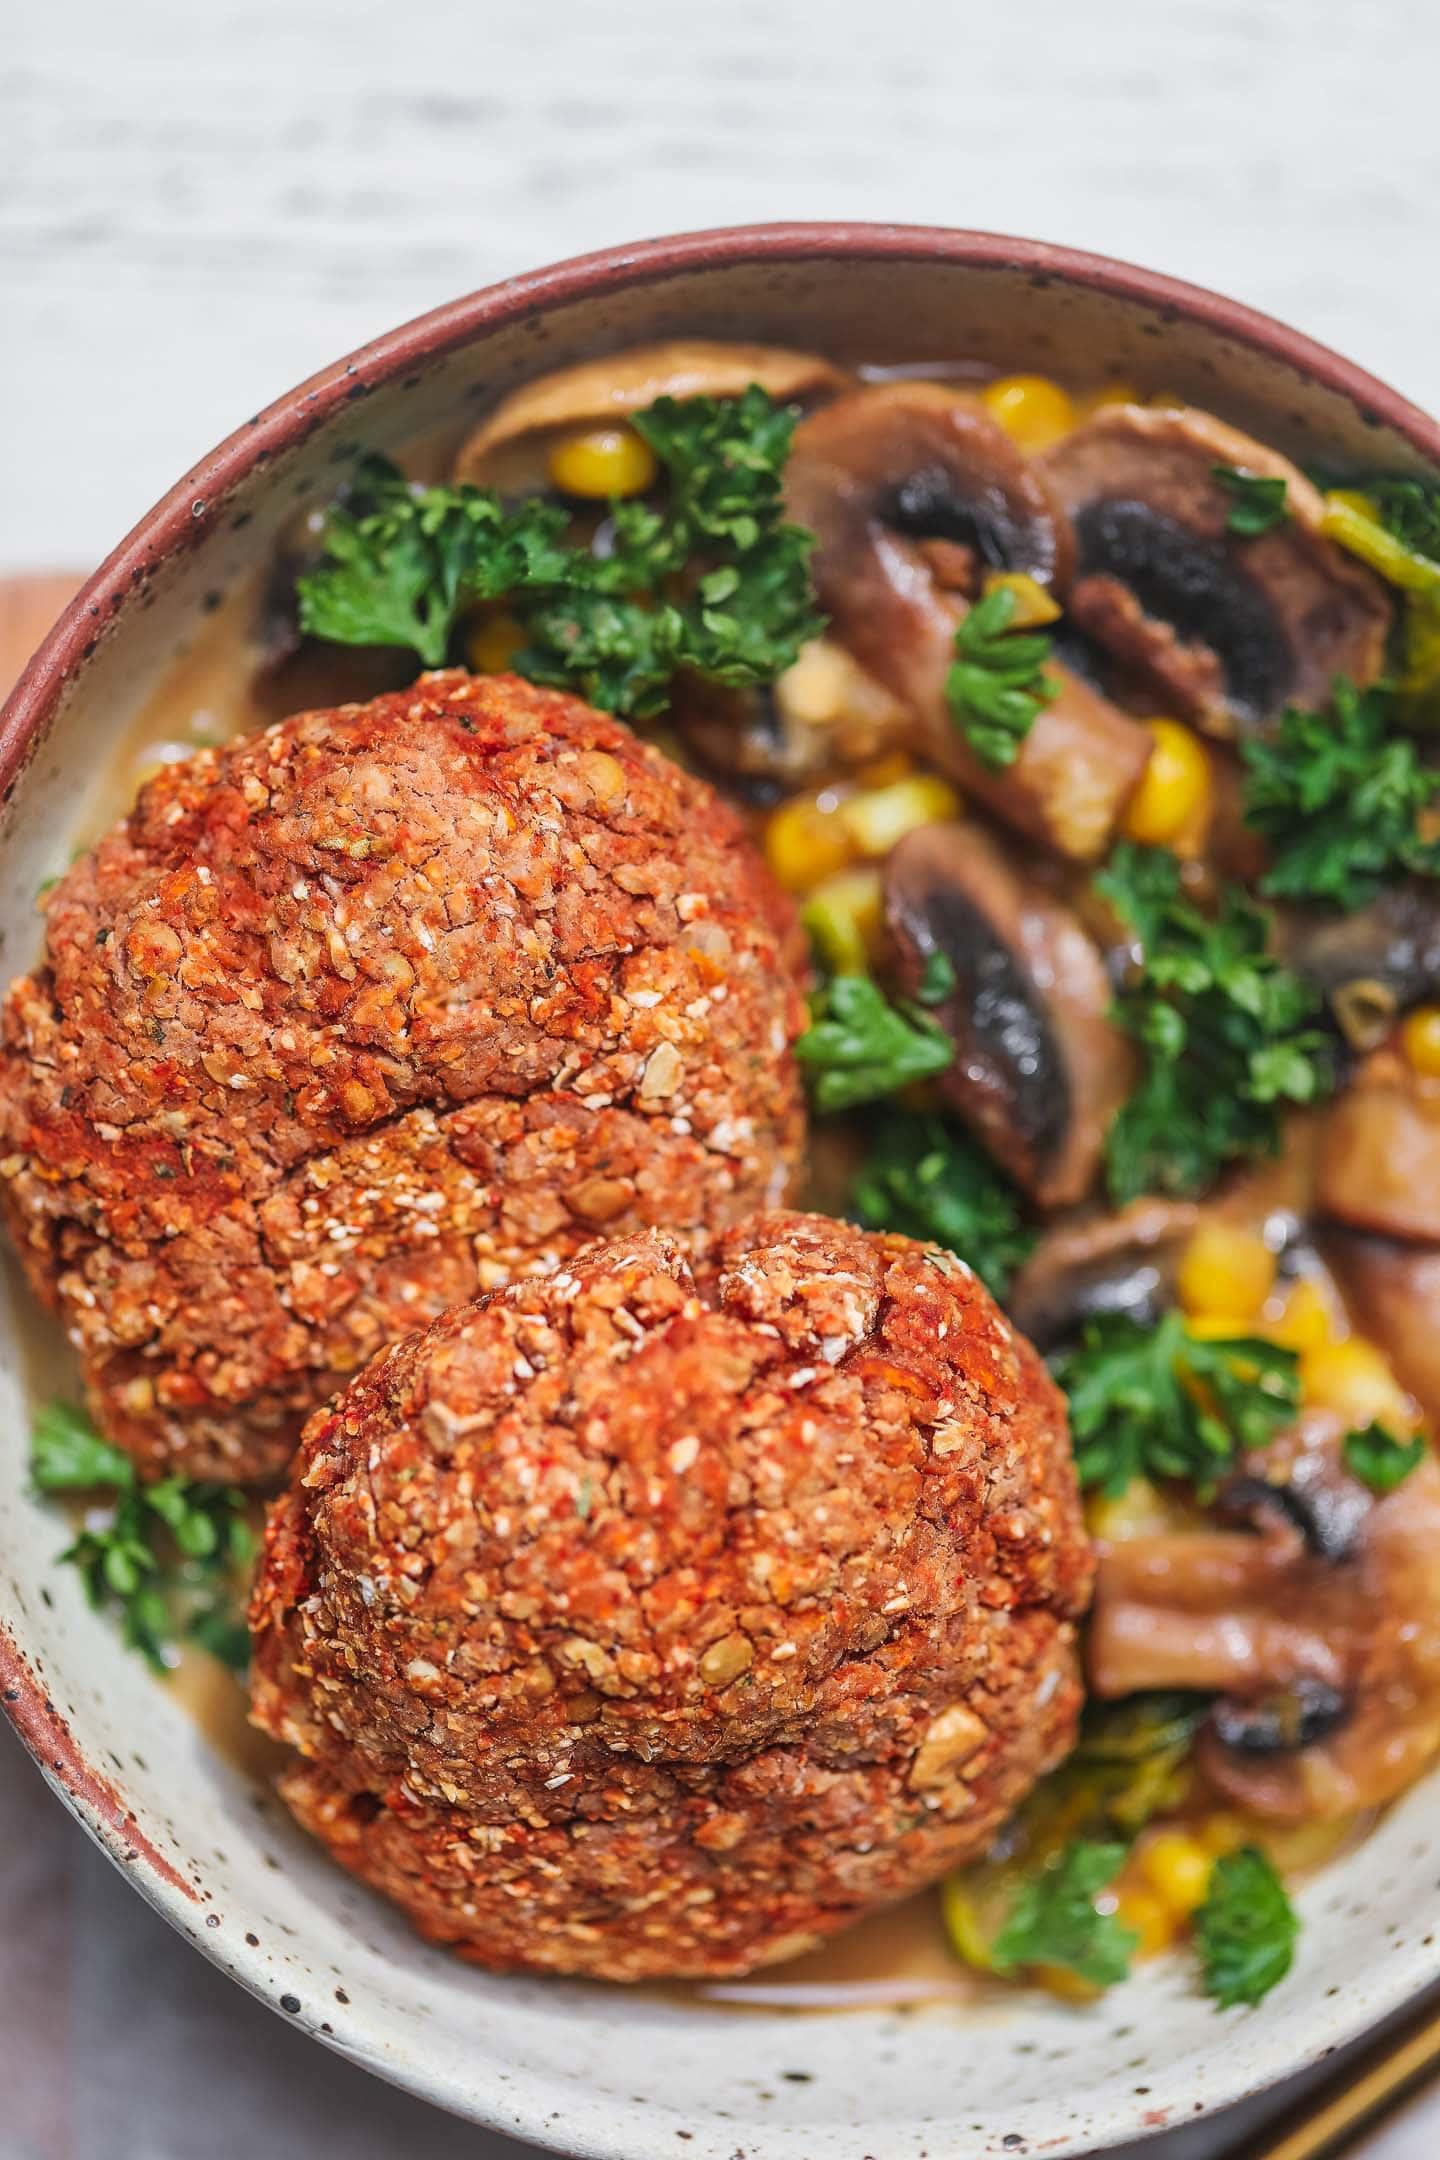 Vegan lentil burgers gluten-free oil-free